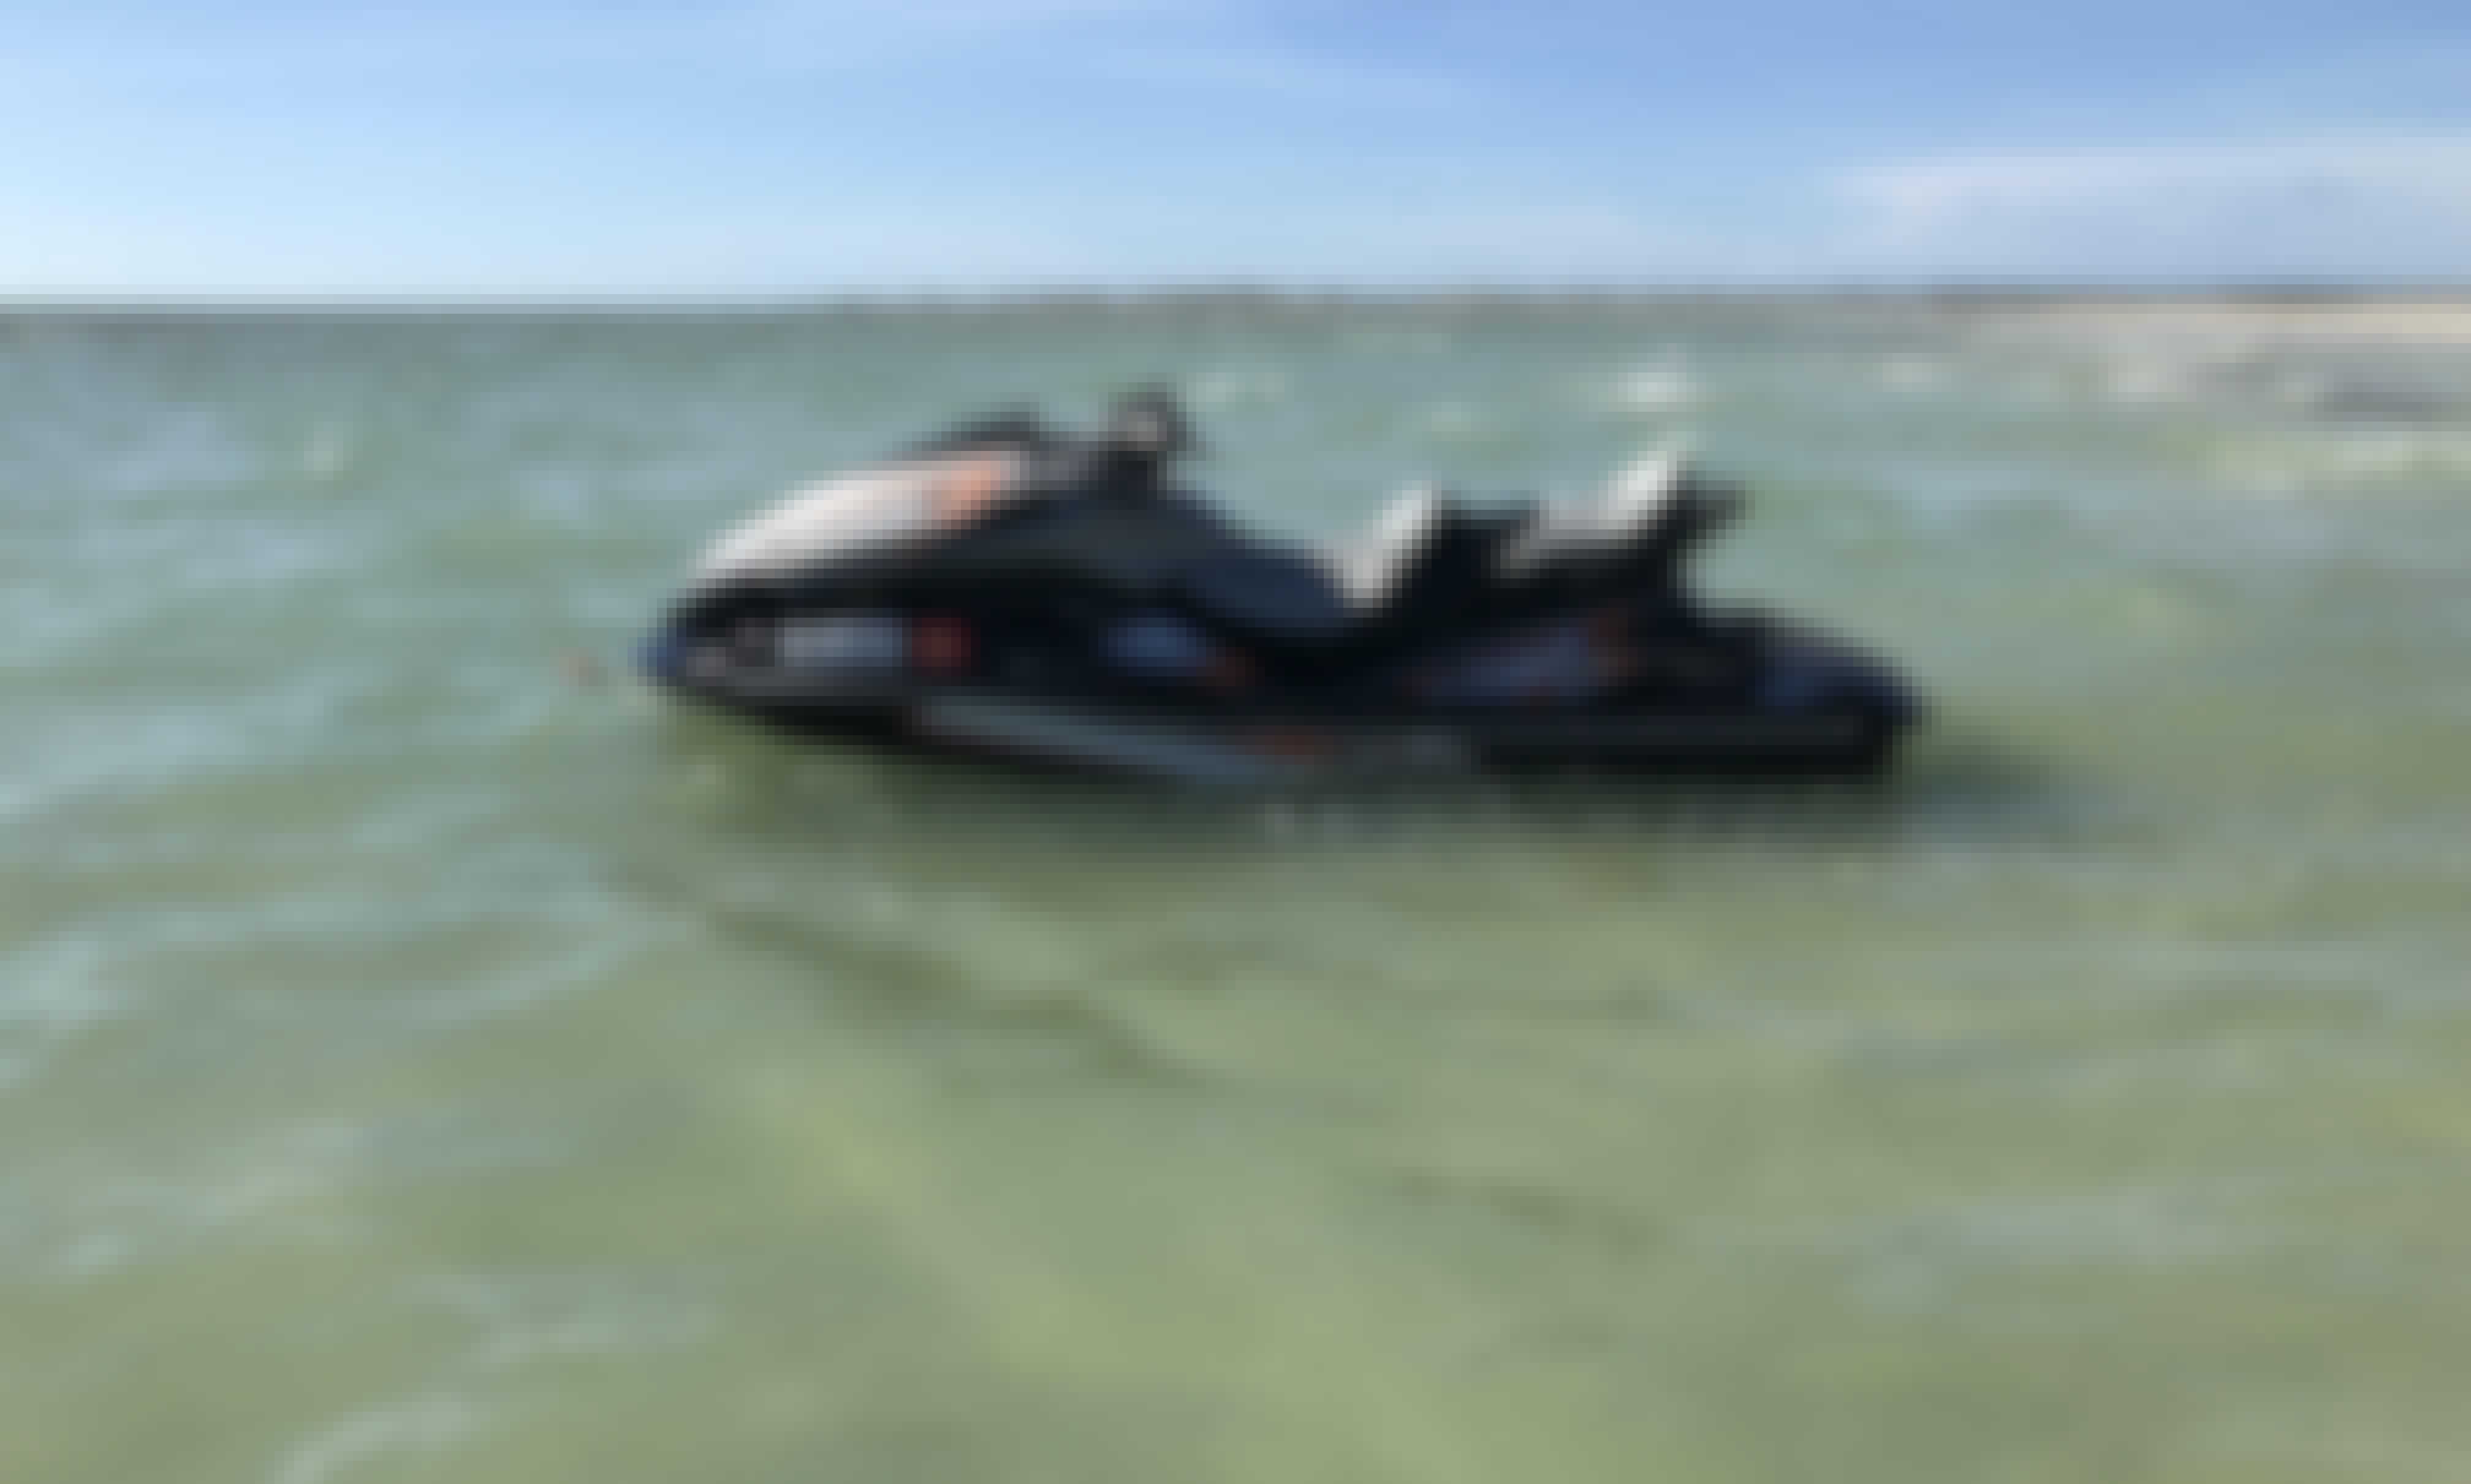 Kawasaki ultra LX Jetski FUN Day on the water!!